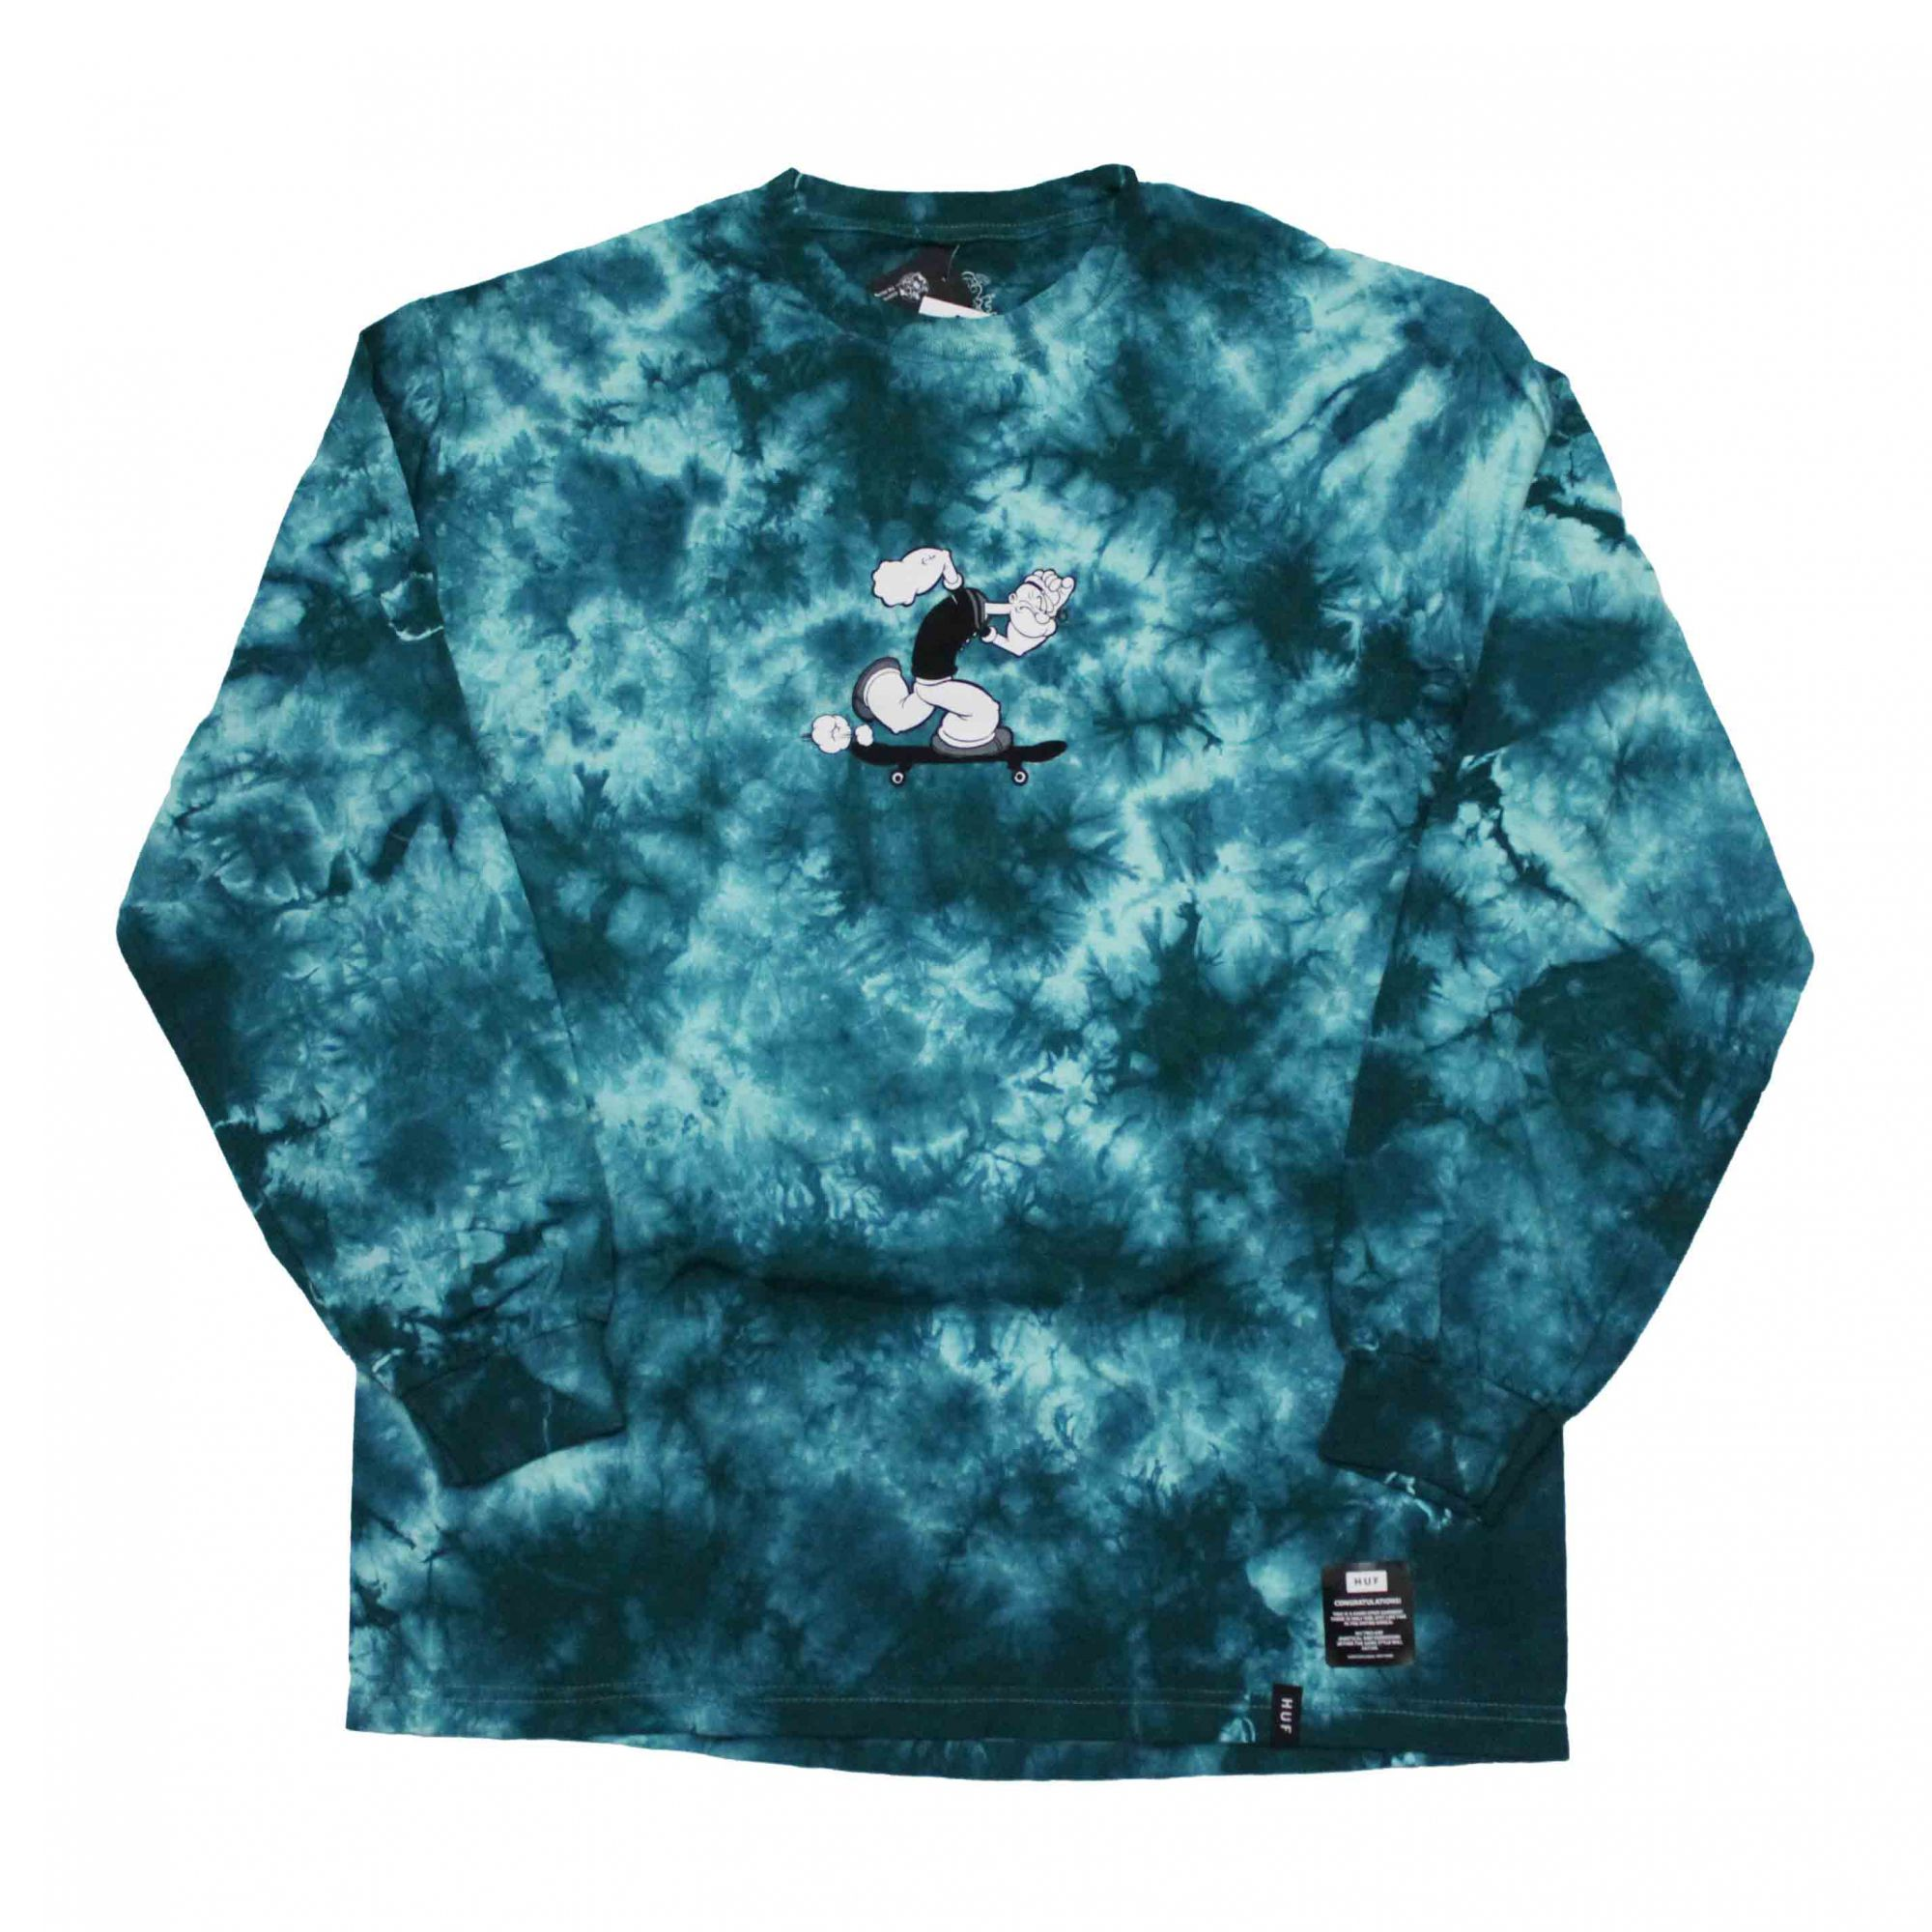 Camiseta Manga Longa HUF x Popeye Skates Tie Dye Verde (Importado)